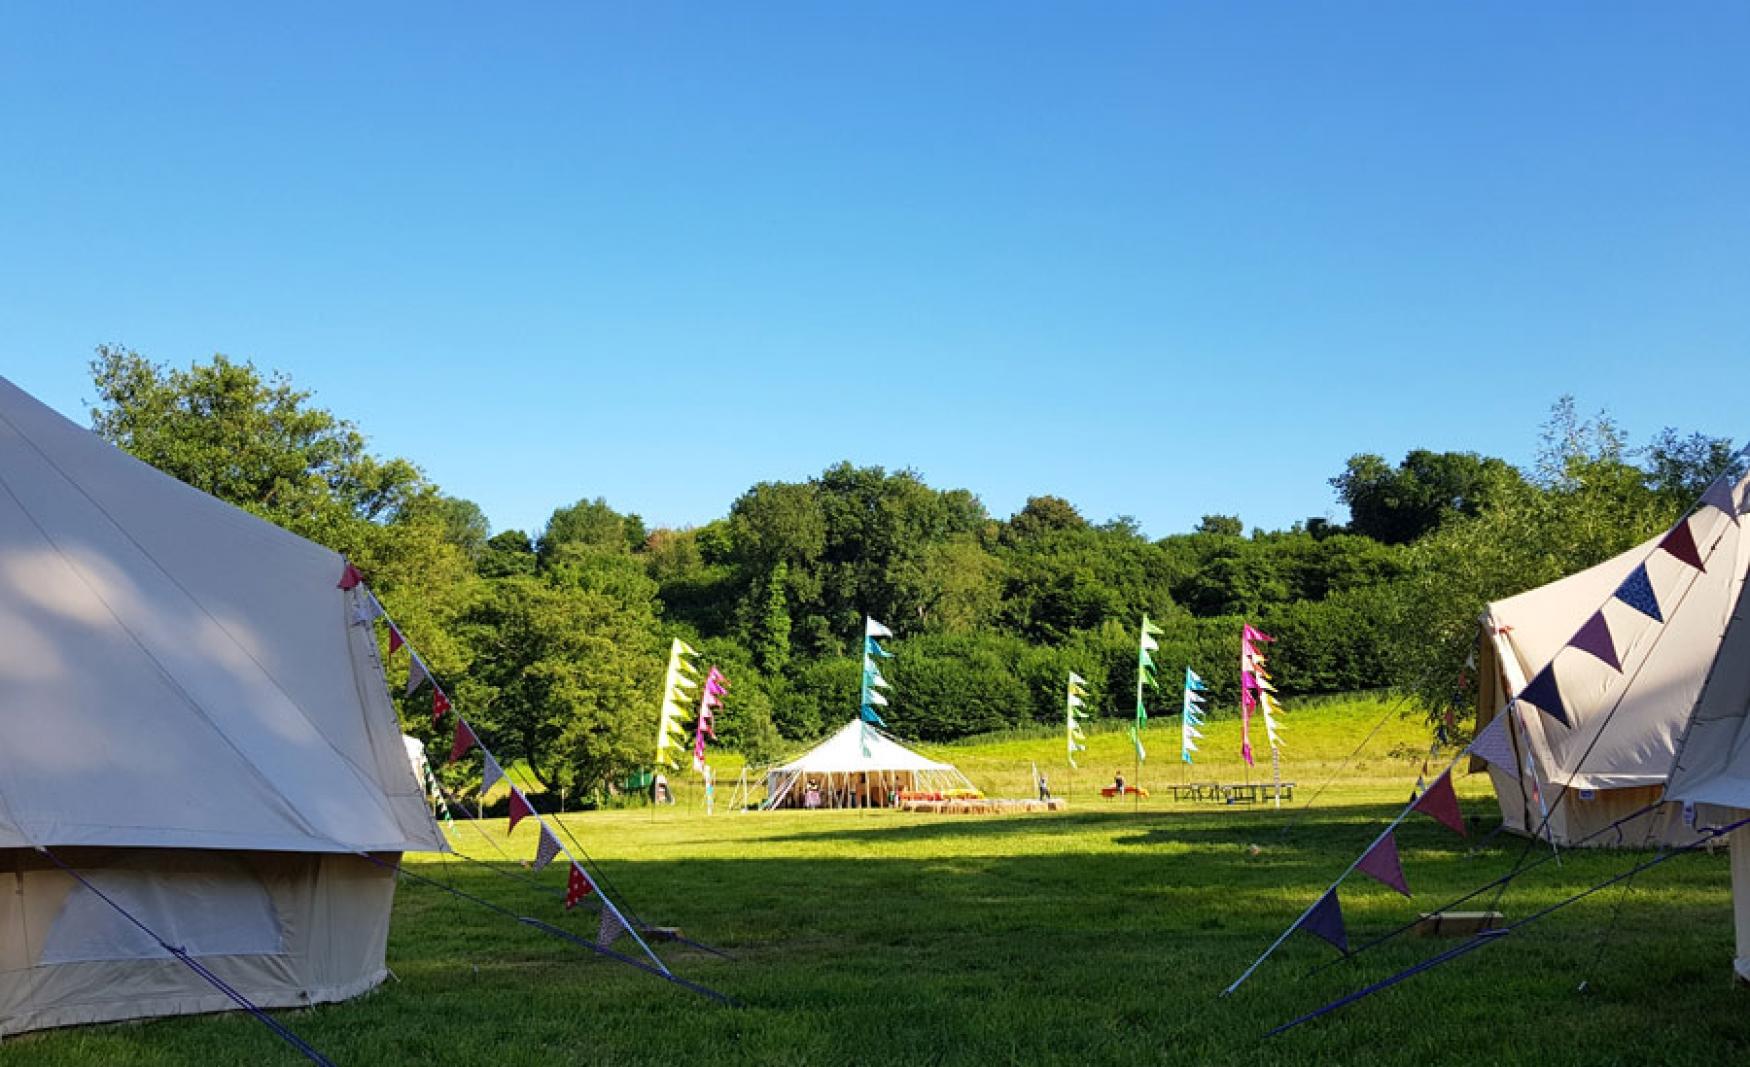 fiesta-fields-outdoor-wedding-events-company-tipi-surrey-sussex-eashing-farm-godalming-4